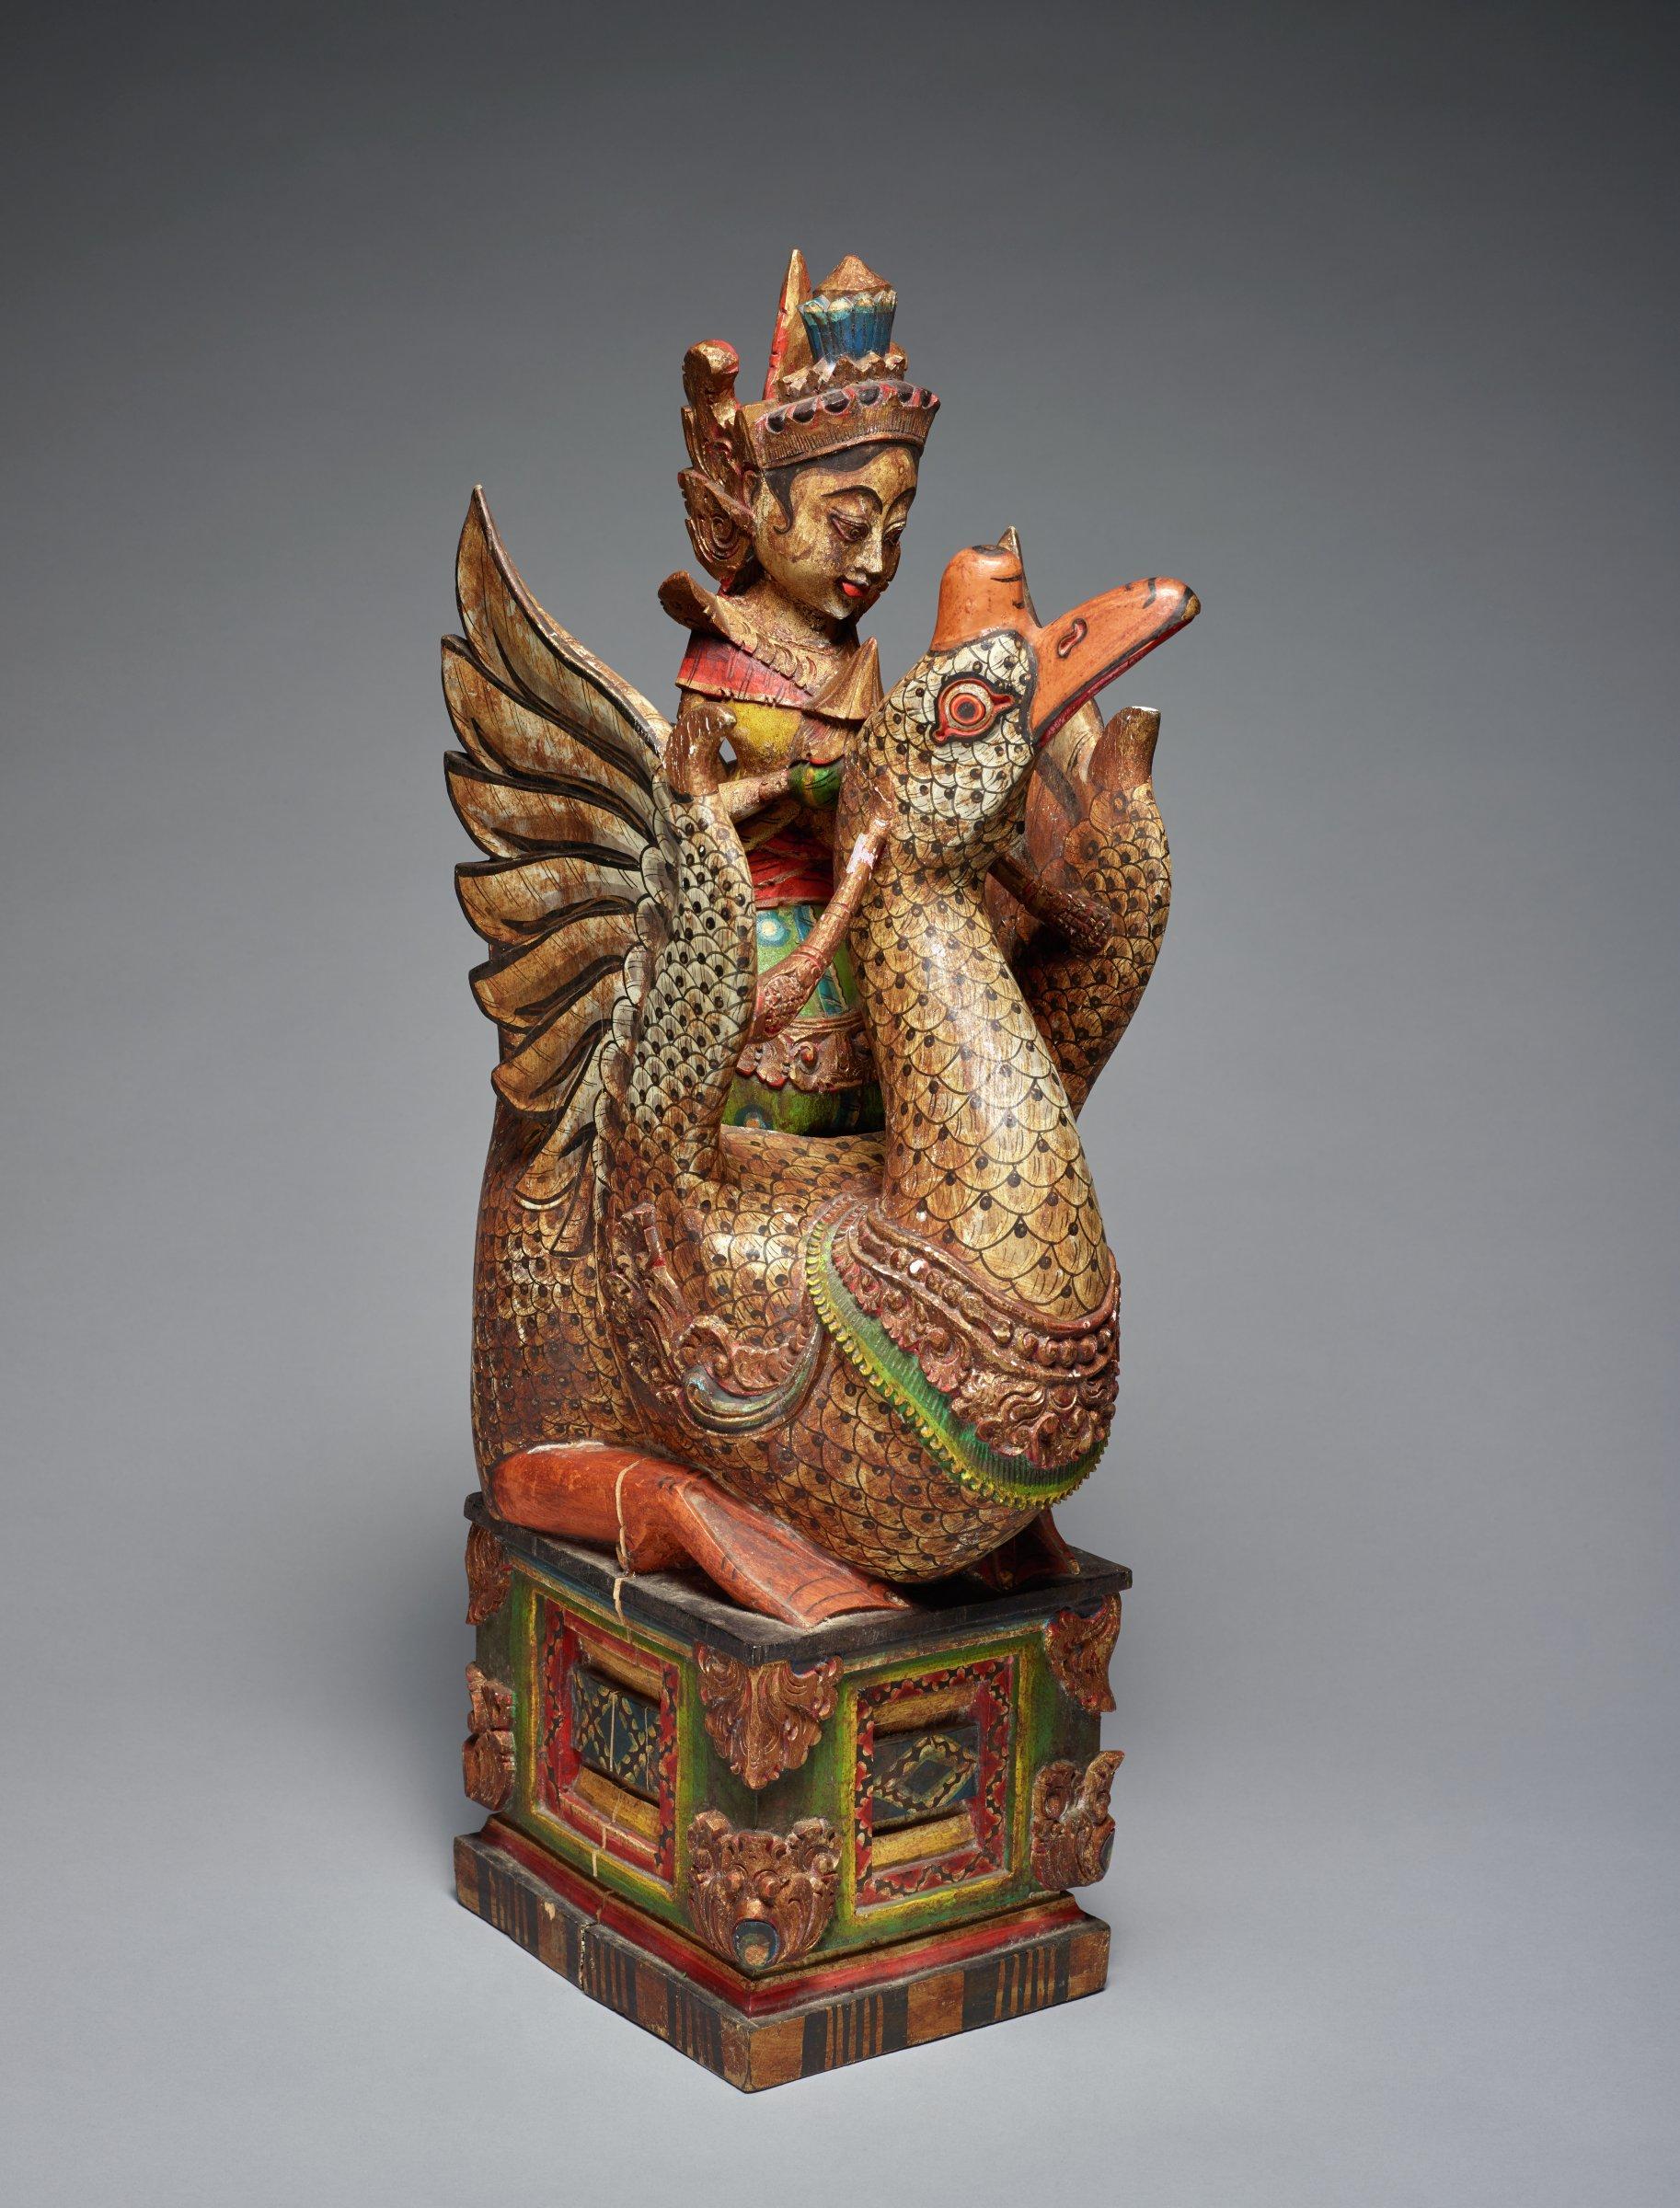 Hamsa, Goose on Ornamental Throne, Indonesia, wood and polychrome